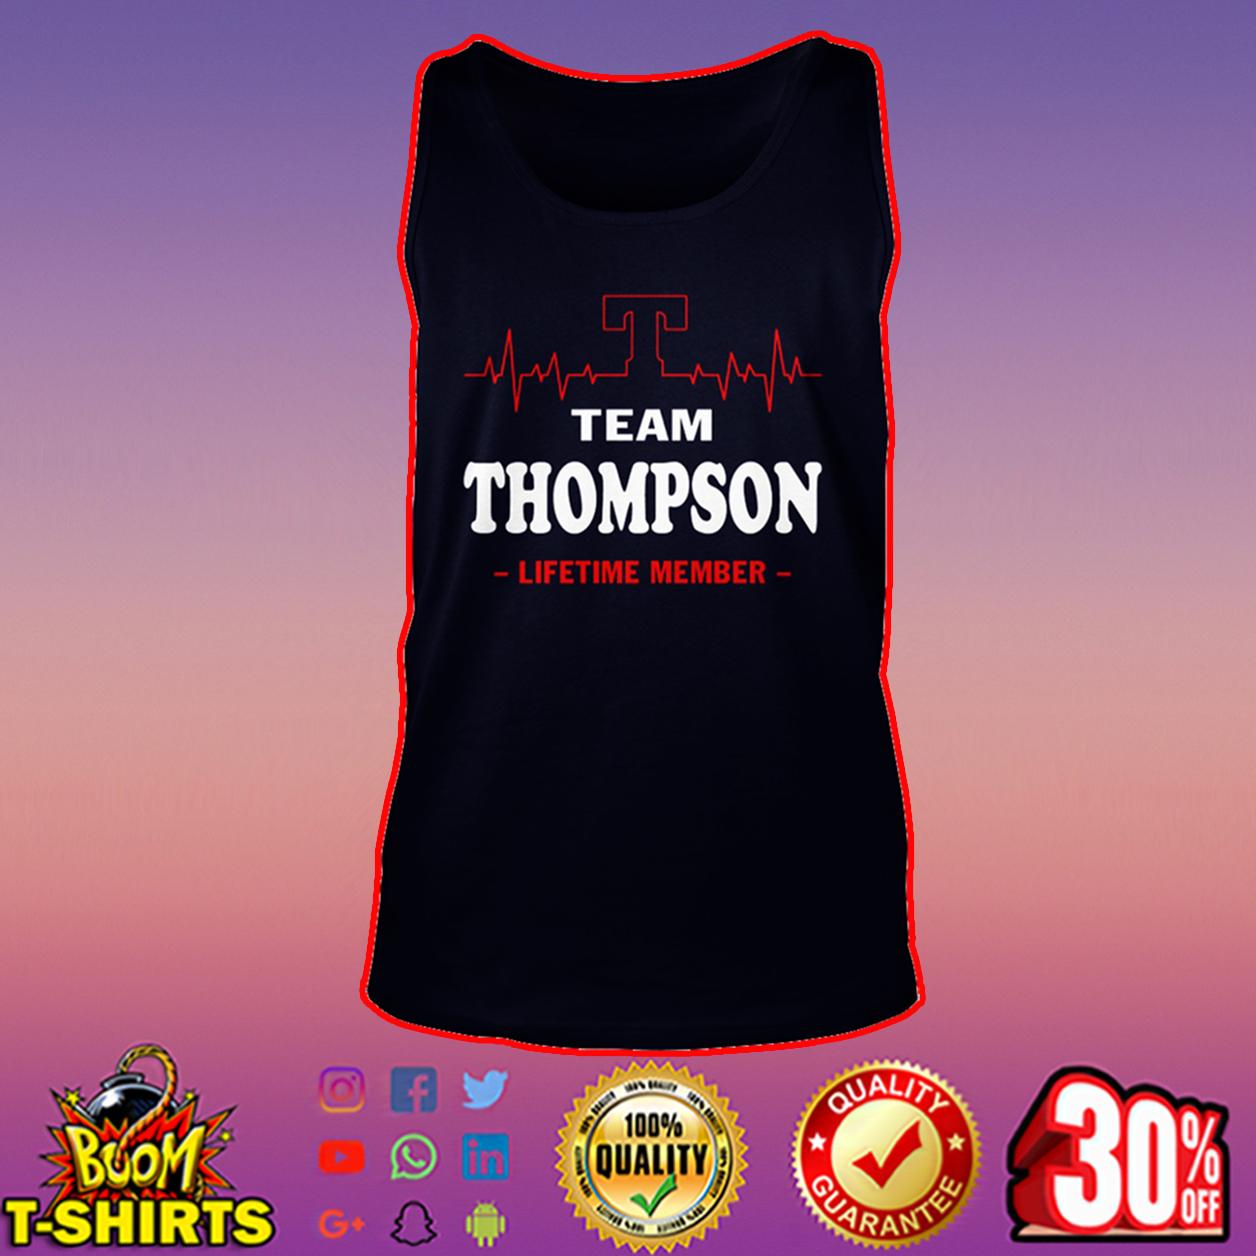 Team Thompson lifetime member tank top